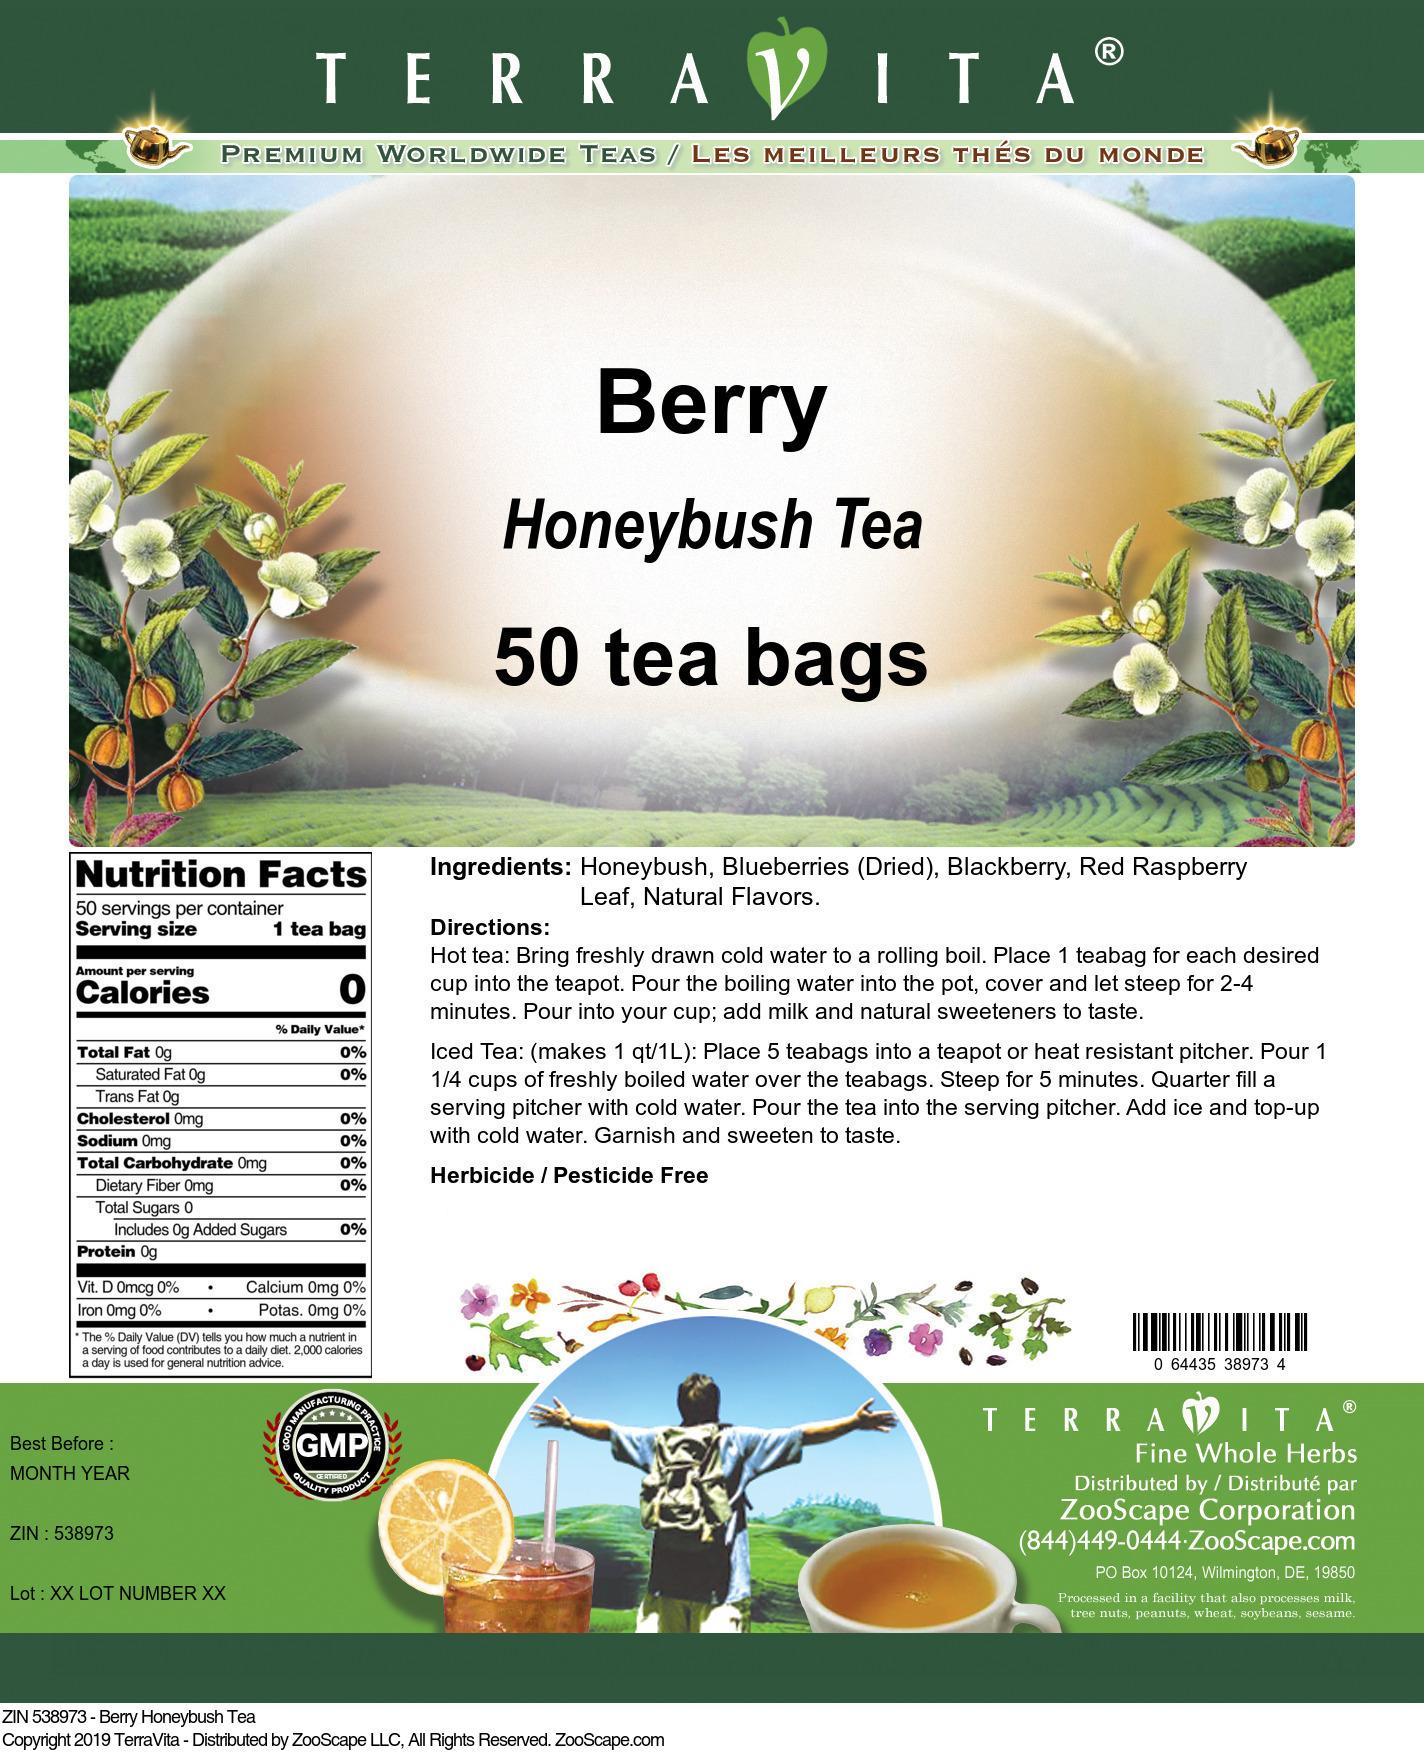 Berry Honeybush Tea